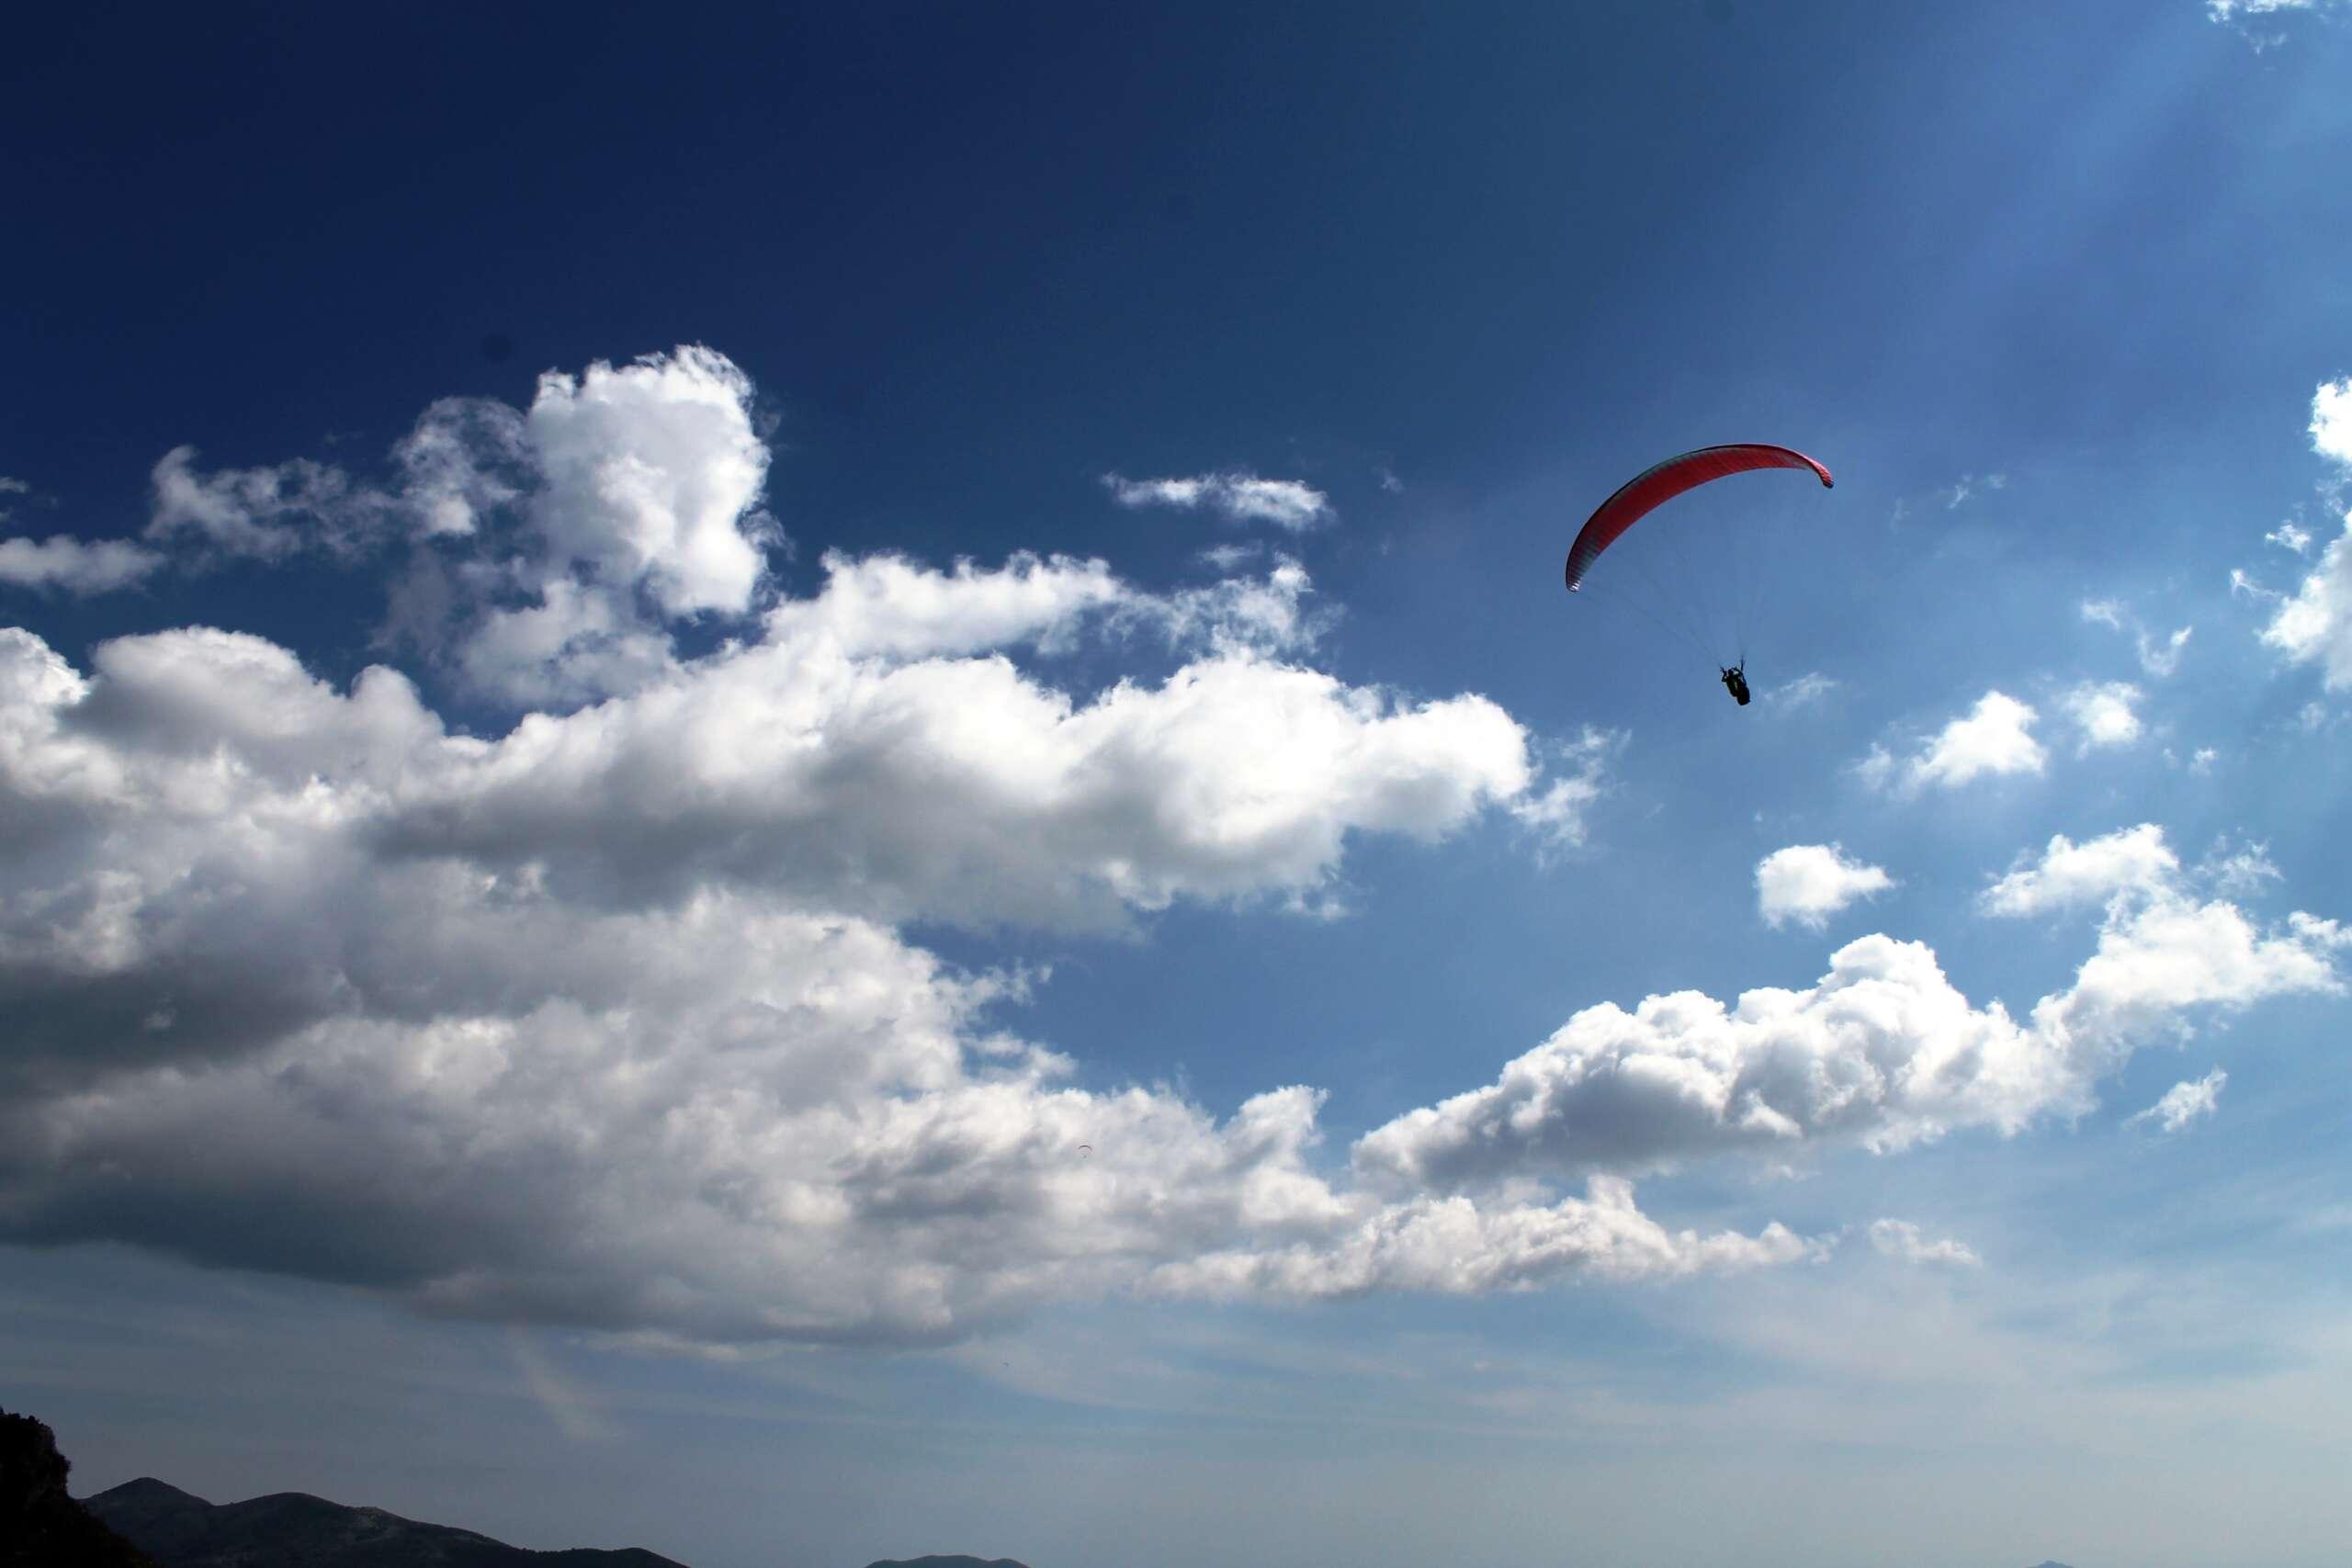 volo in cielo con parapendio biposto